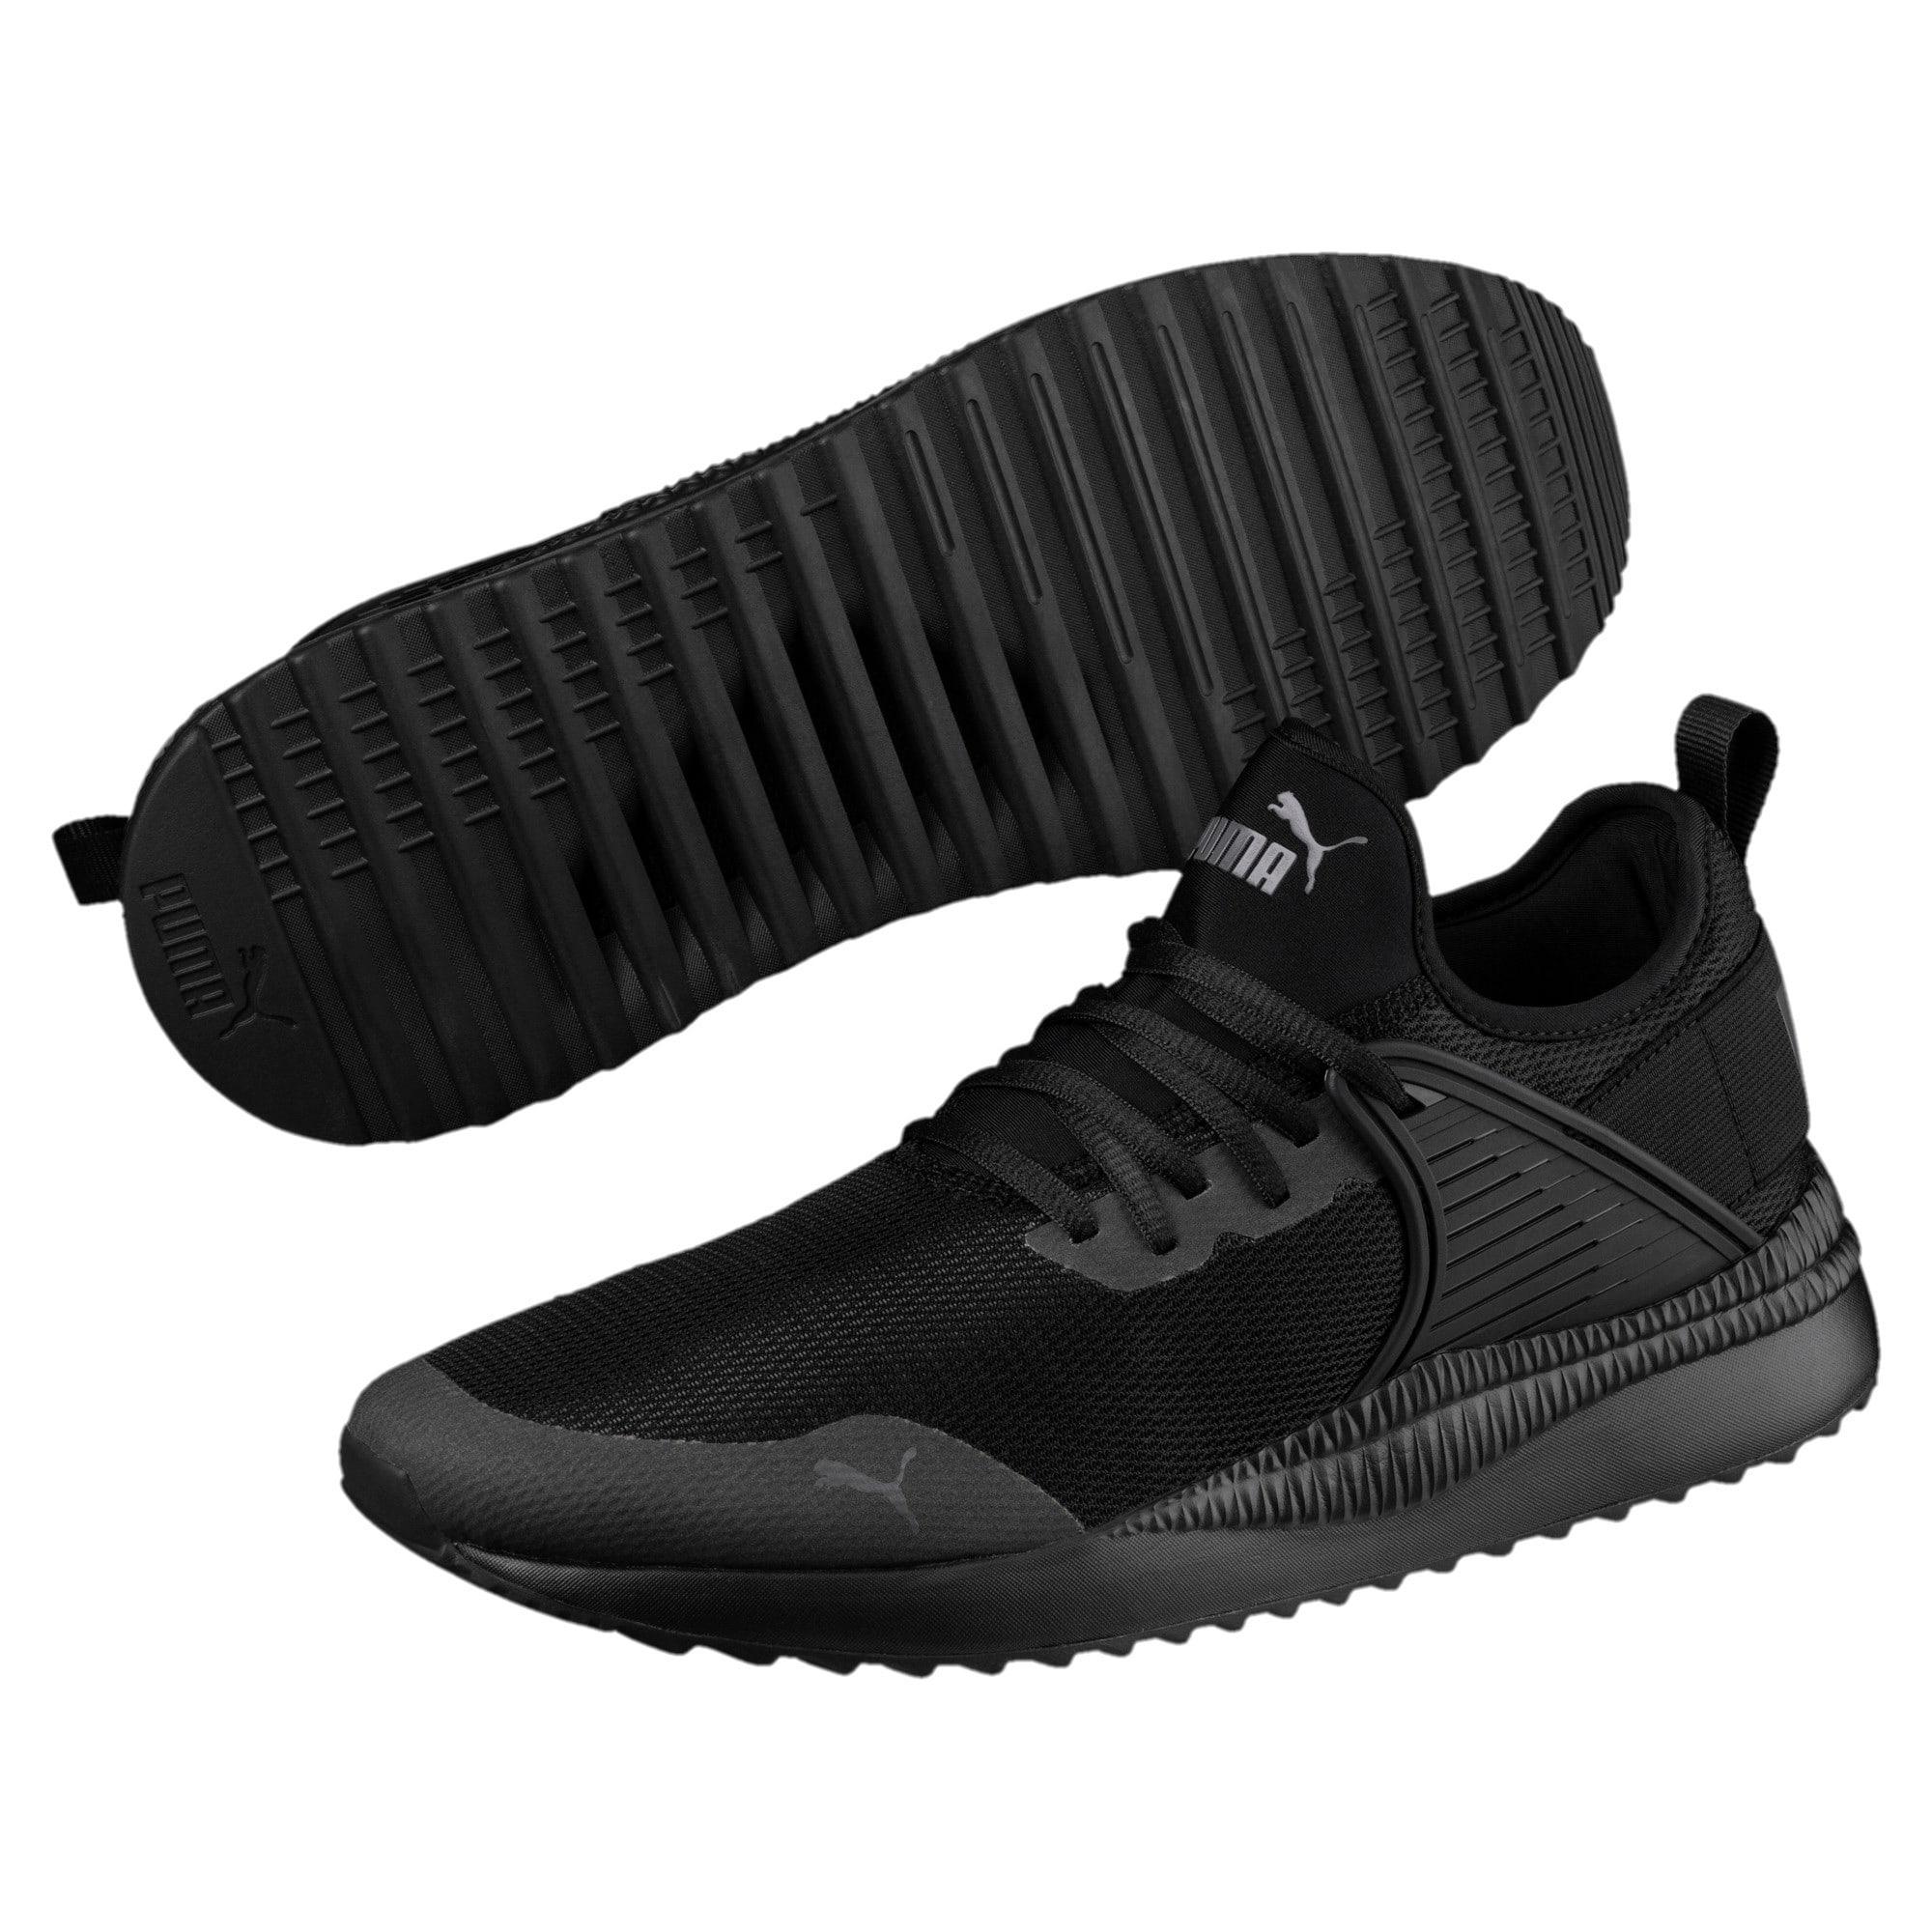 Thumbnail 2 of Pacer Next Cage Sneakers, Puma Black-Puma Black, medium